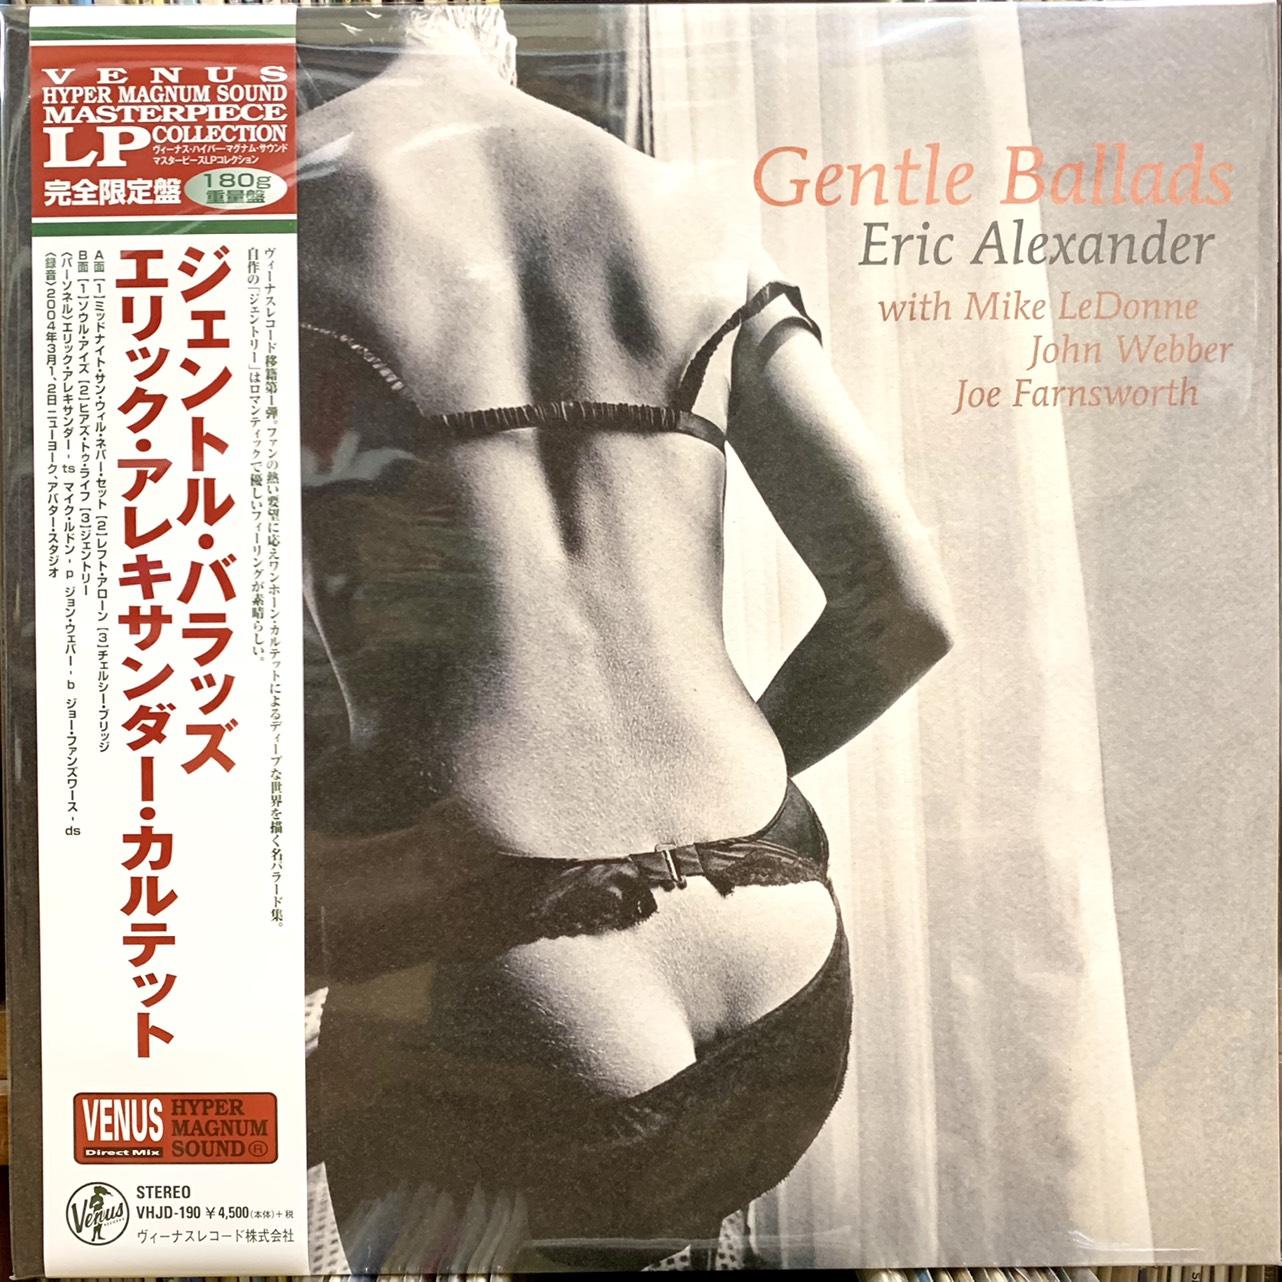 dia-than-vinyl-gentle-ballad-erick-alexander-quartet